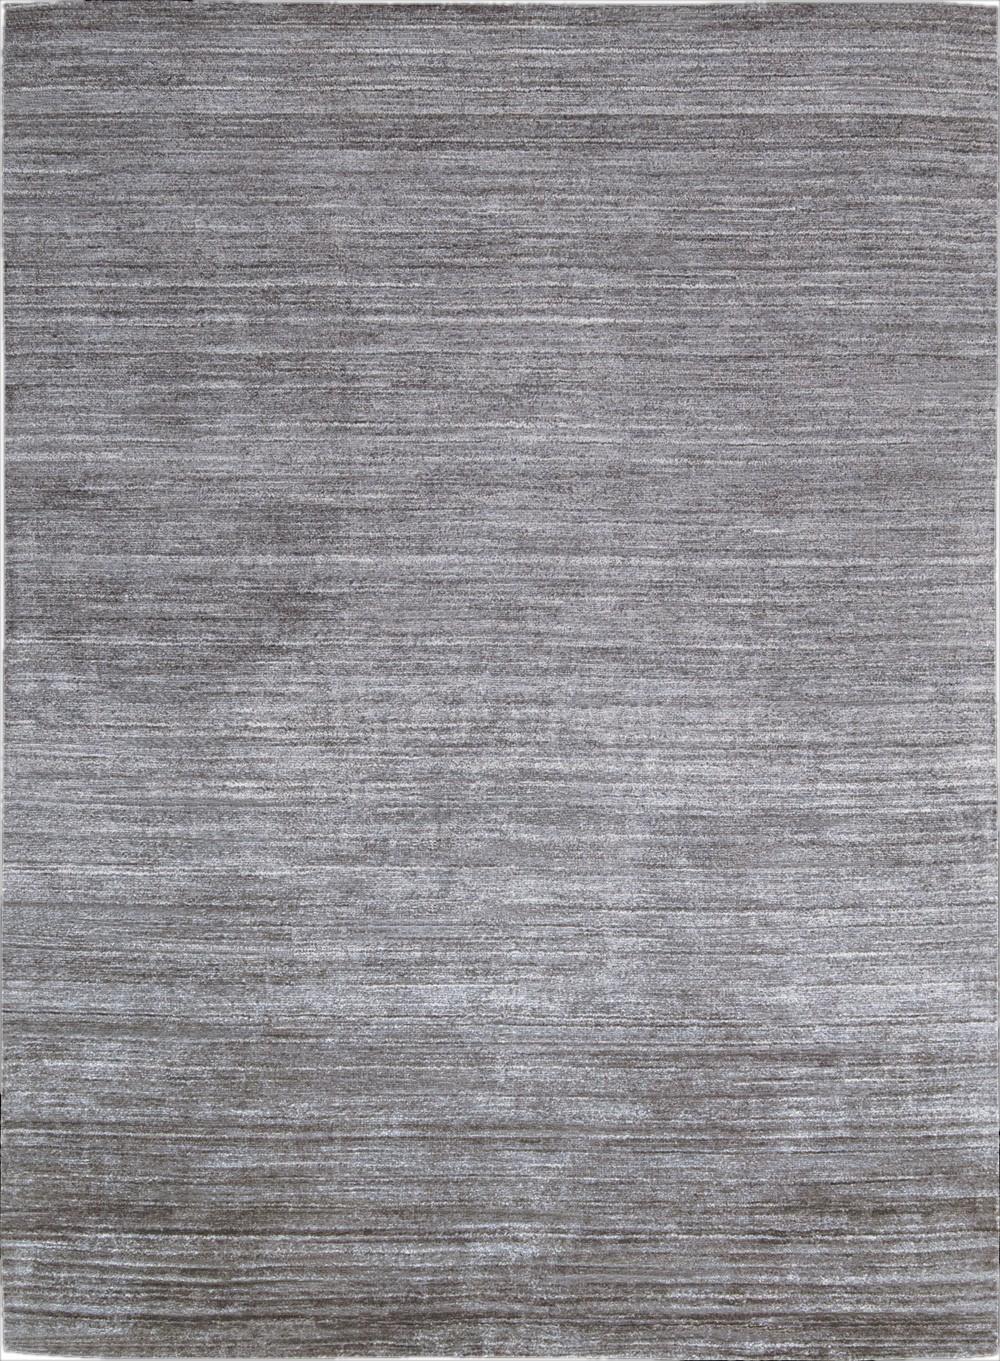 Calvin Klein Home Shimmer Shim1 Graph Mineral Graphite Area Rug